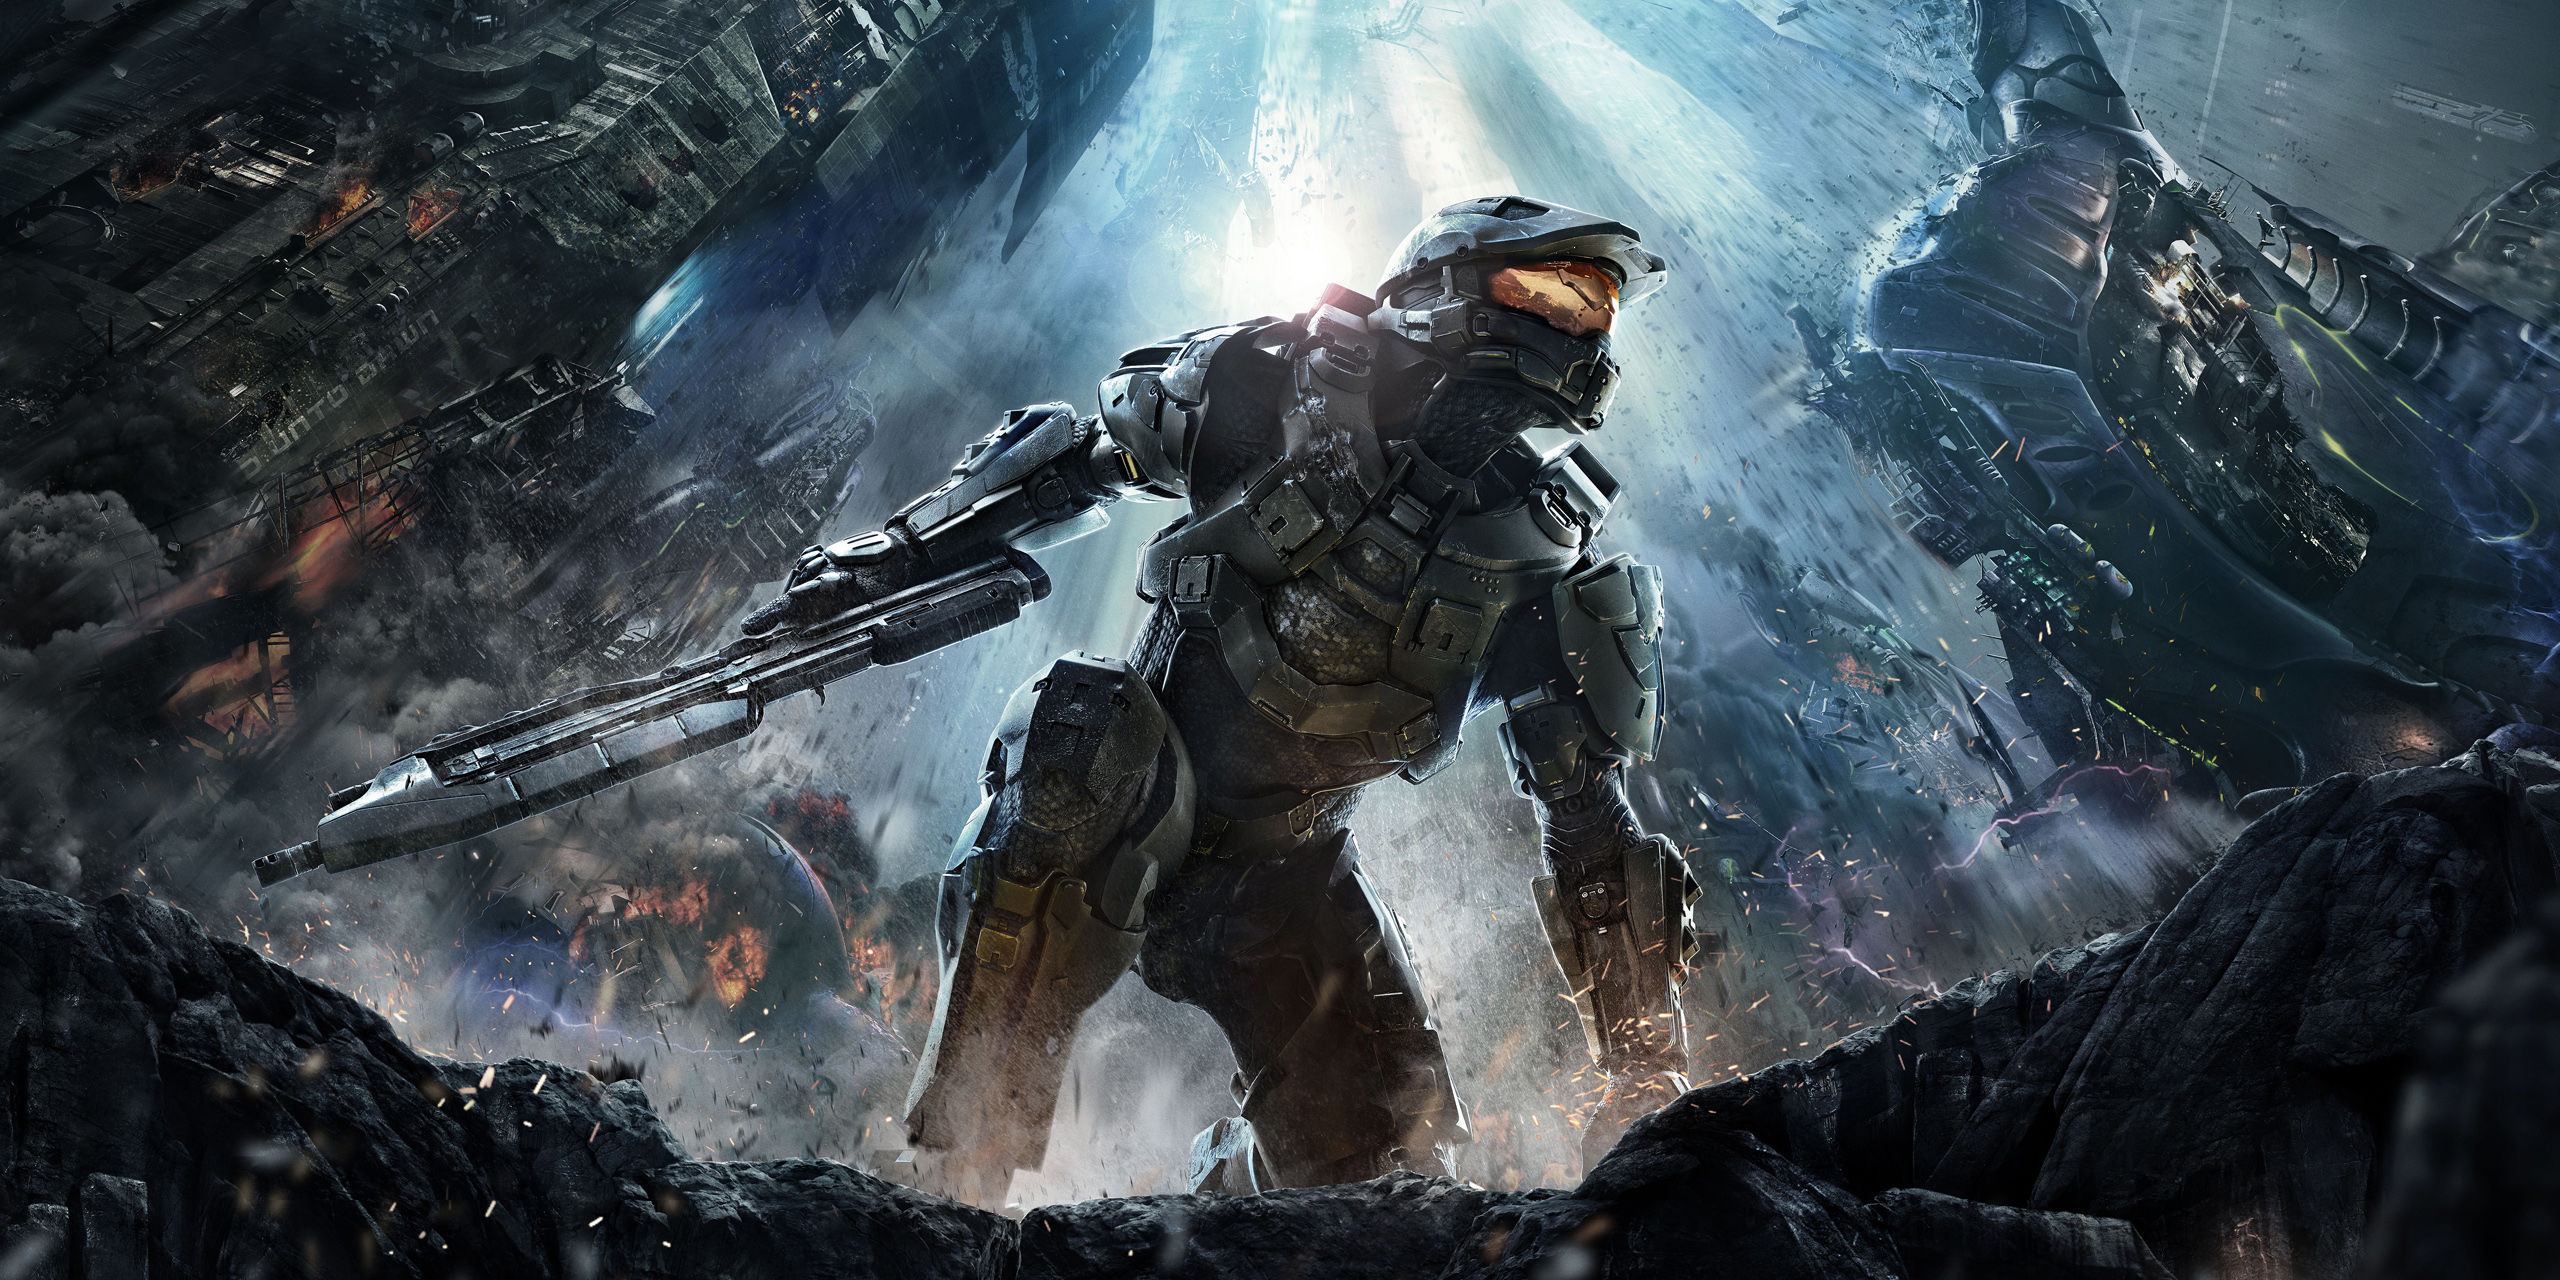 Durchgespielt: Halo 3, Halo 3: ODST & Halo 4